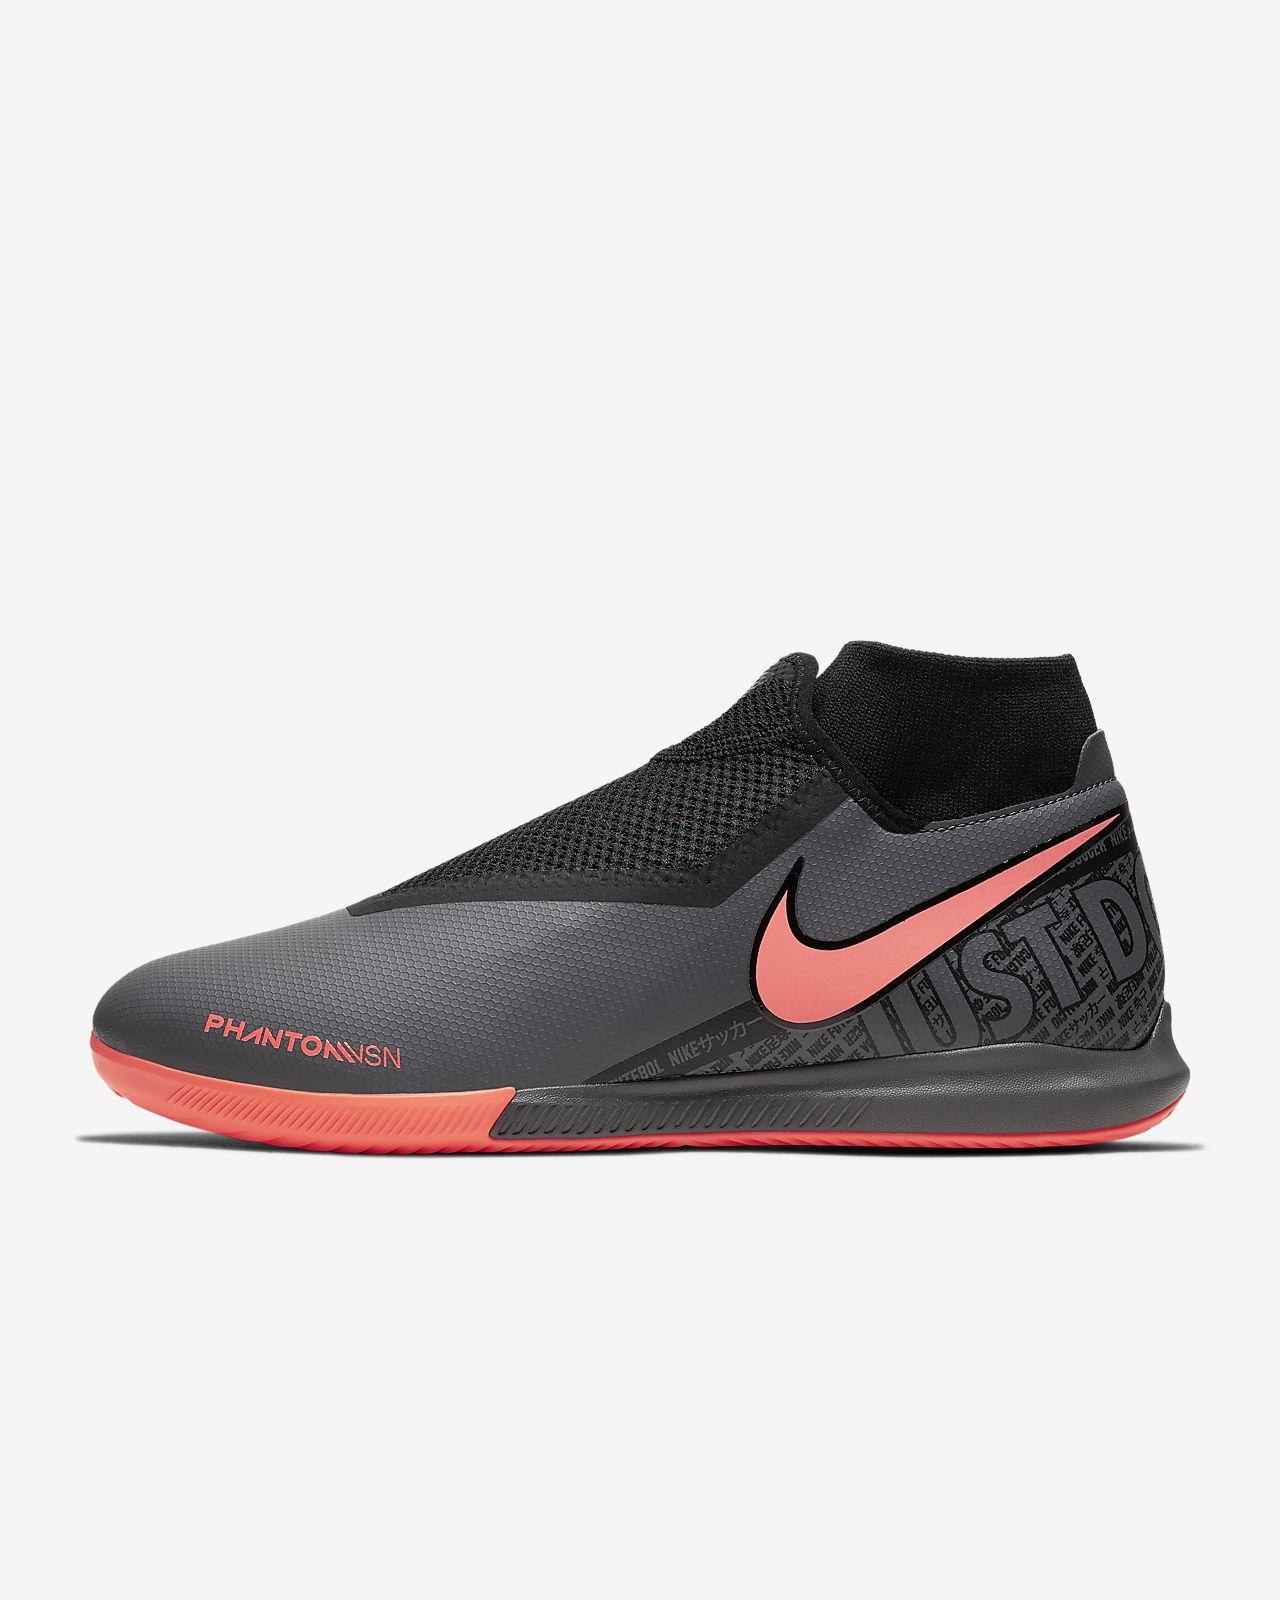 Nike Phantom Vision Academy Dynamic Fit IC 體育館/路面足球鞋